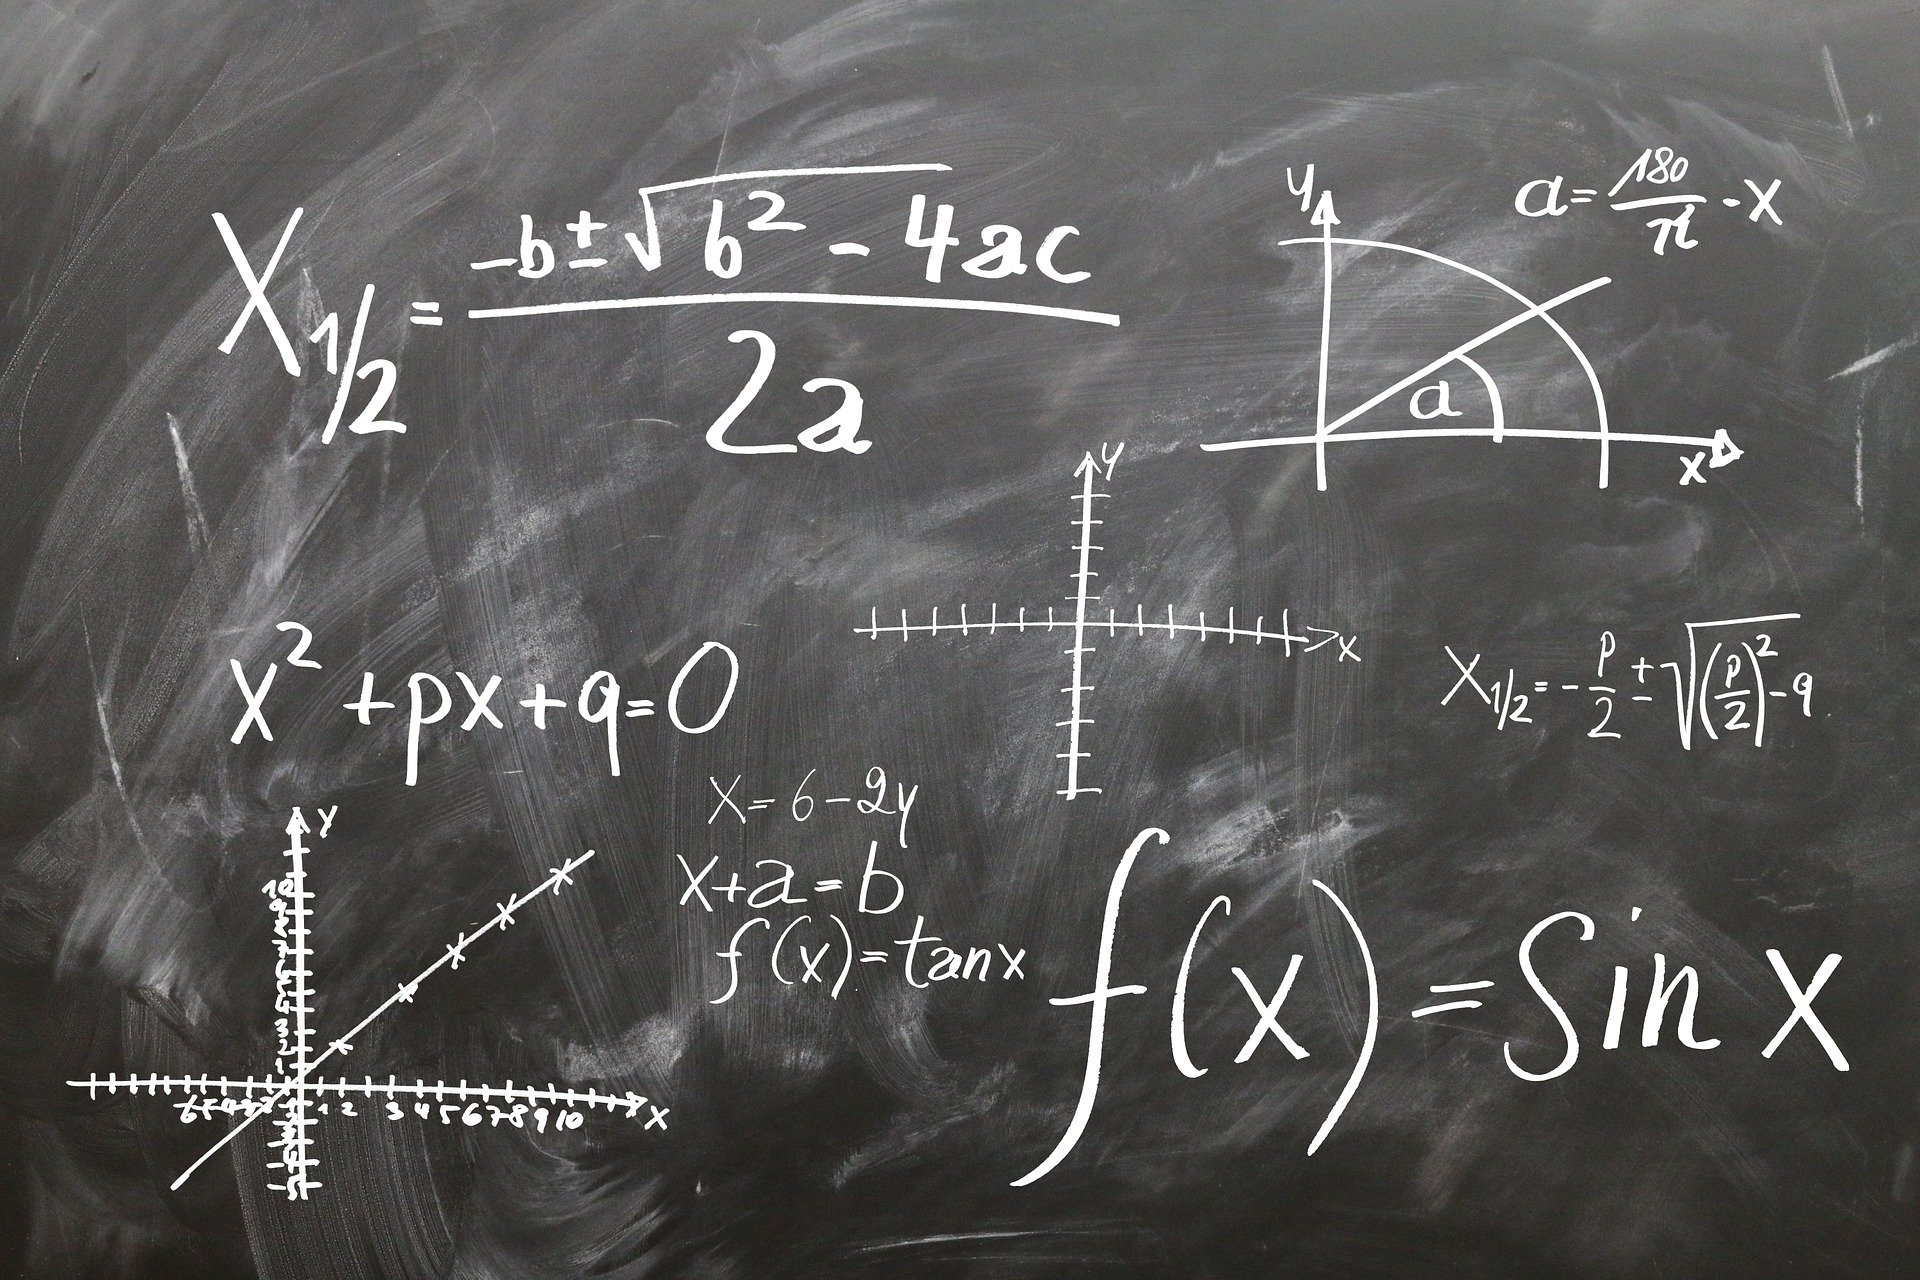 Bill and Melinda Gates Foundation Invites Grand Challenge Proposals for Algebra 1